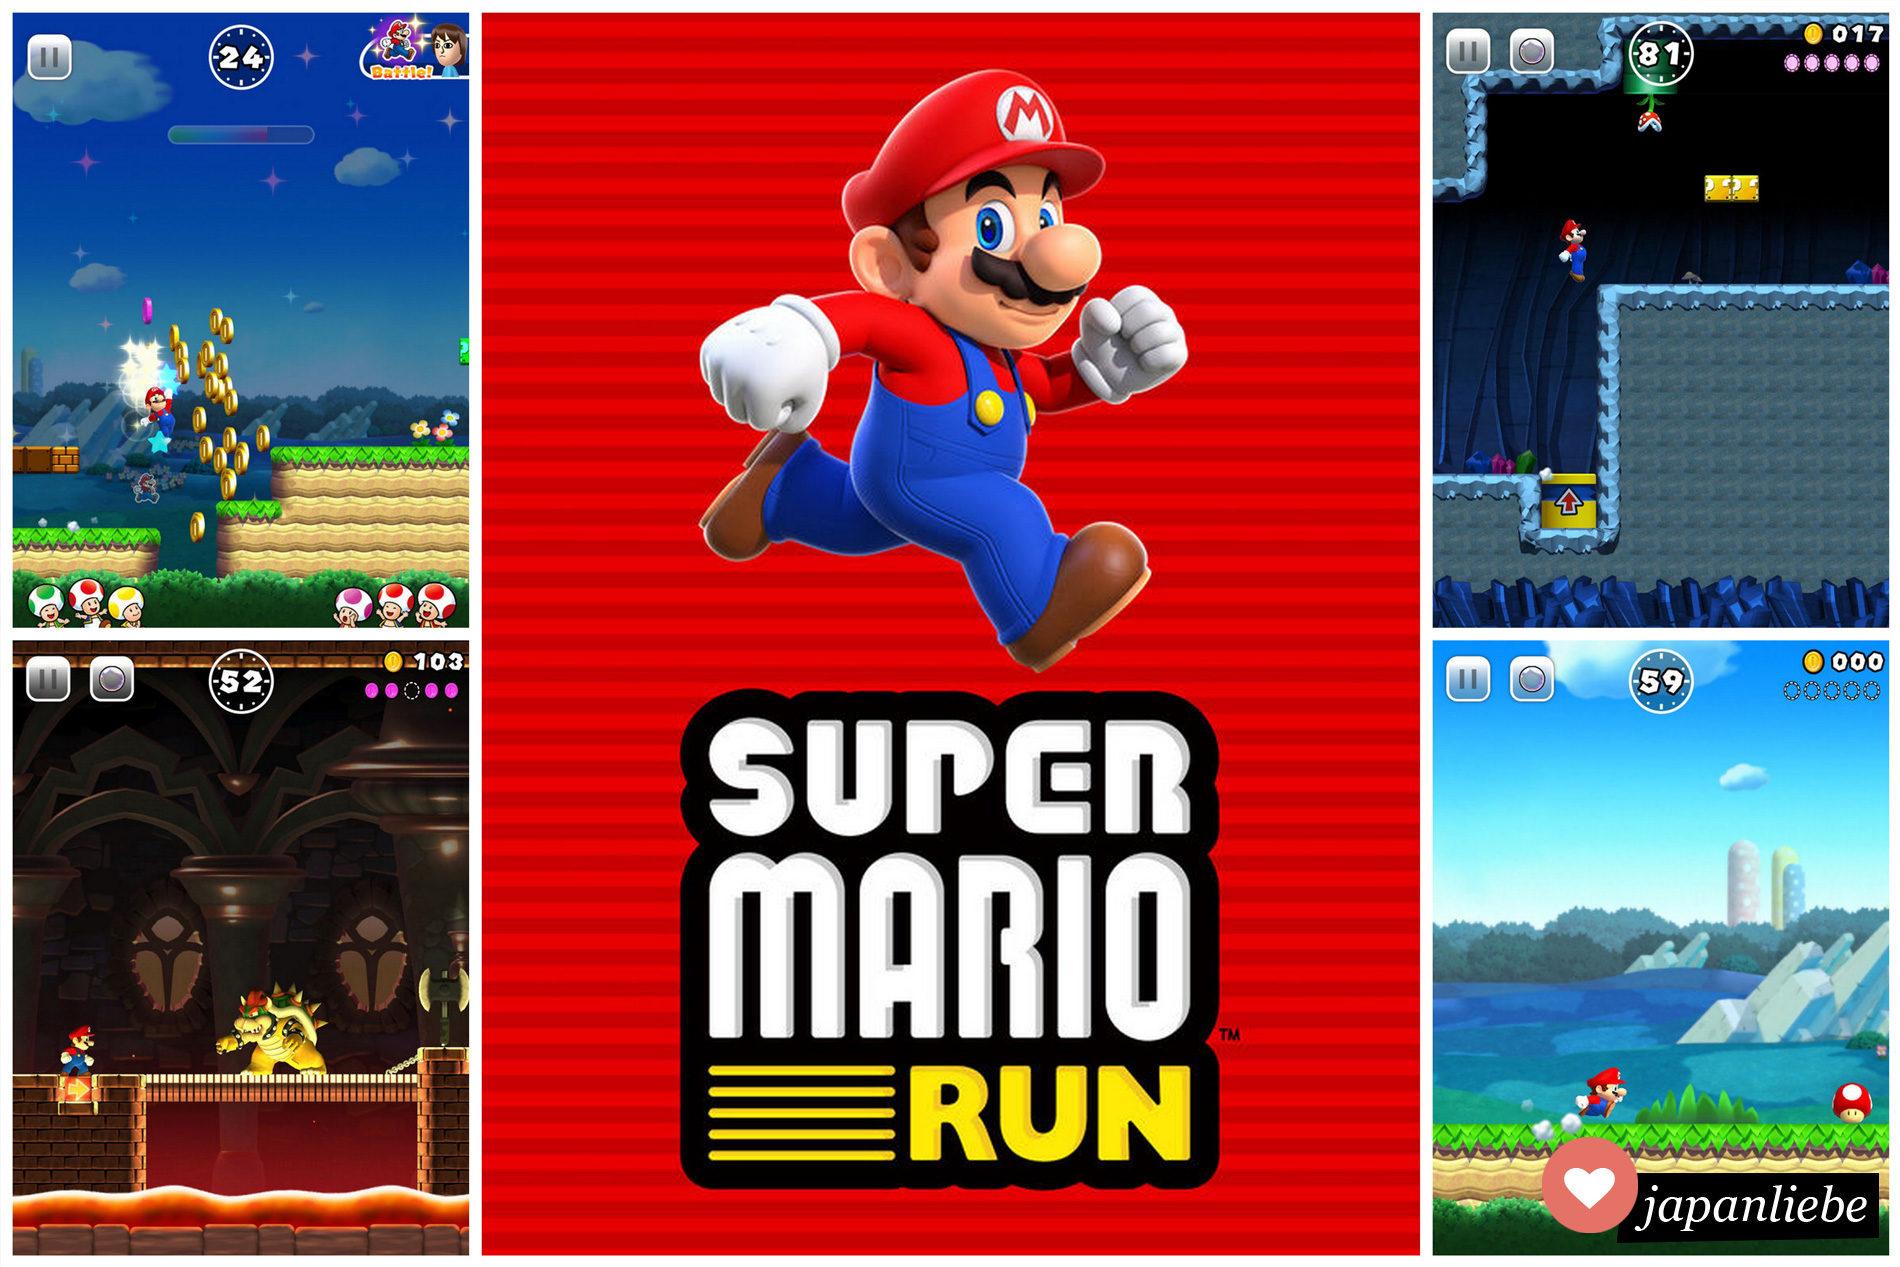 Nintendo bringt Super Mario Run für iPhone und iPad